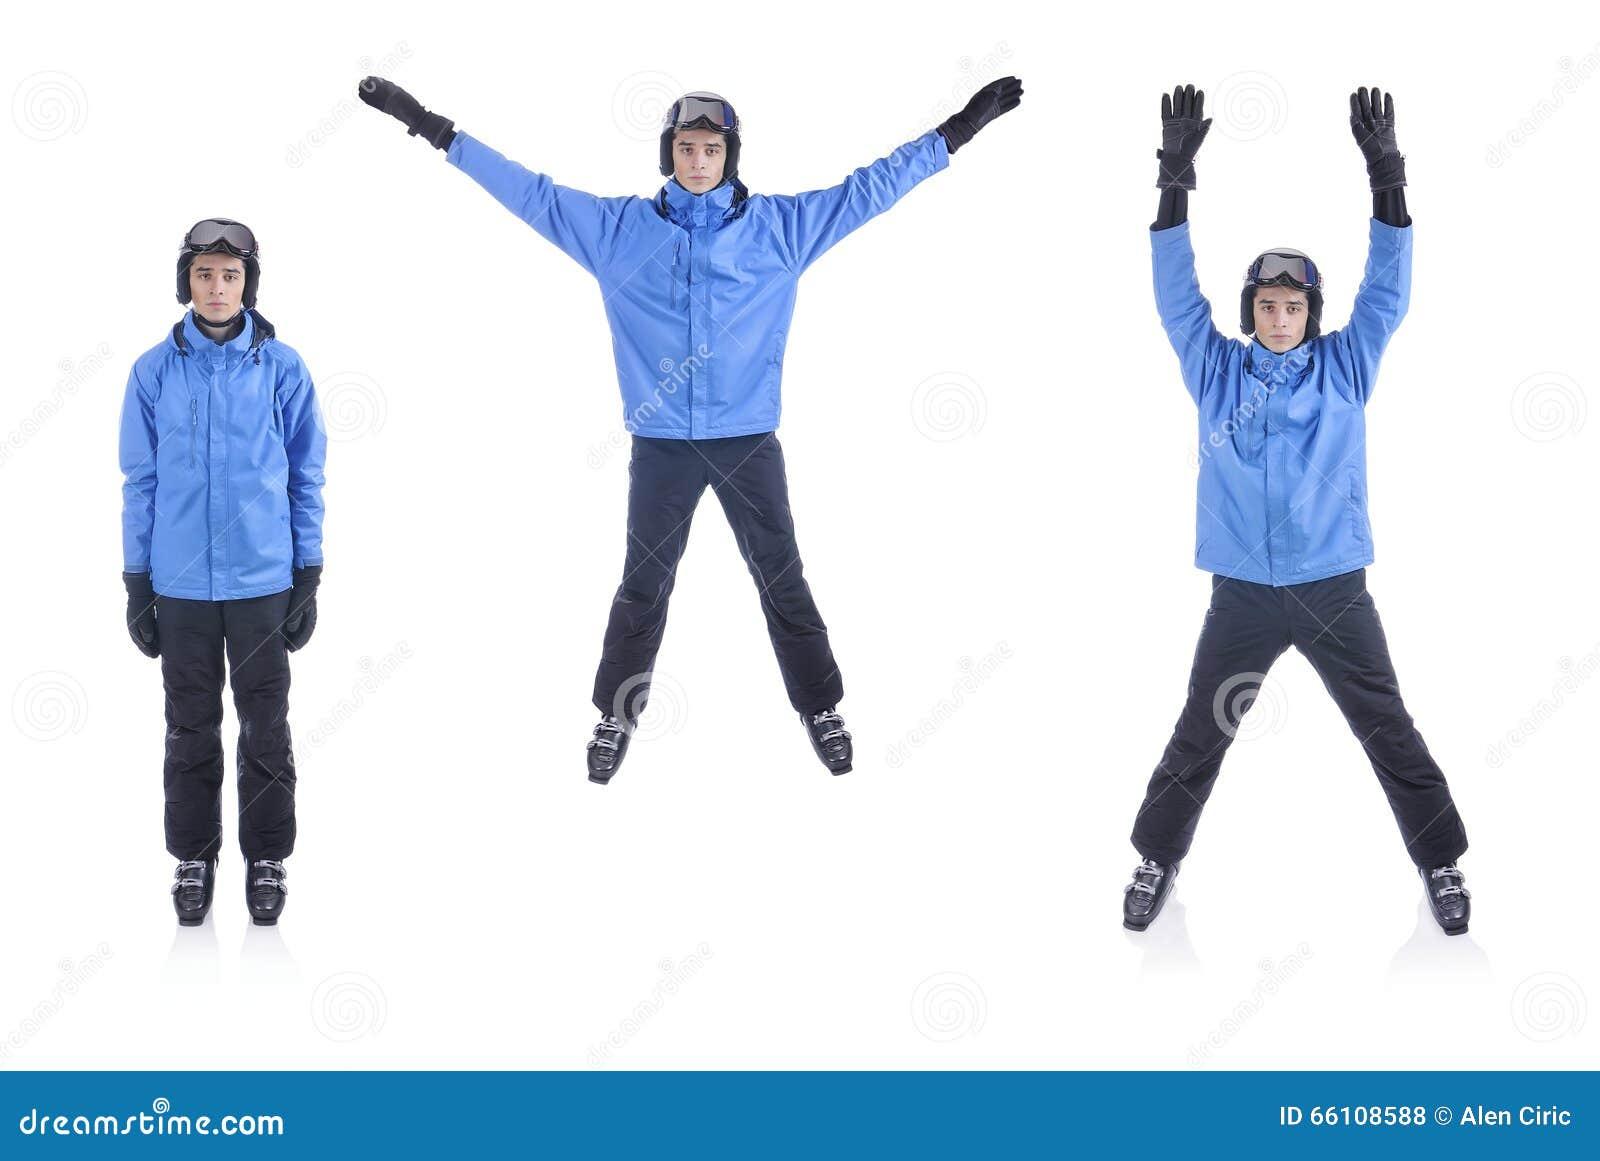 imagenes de ejercicios jumping jacks